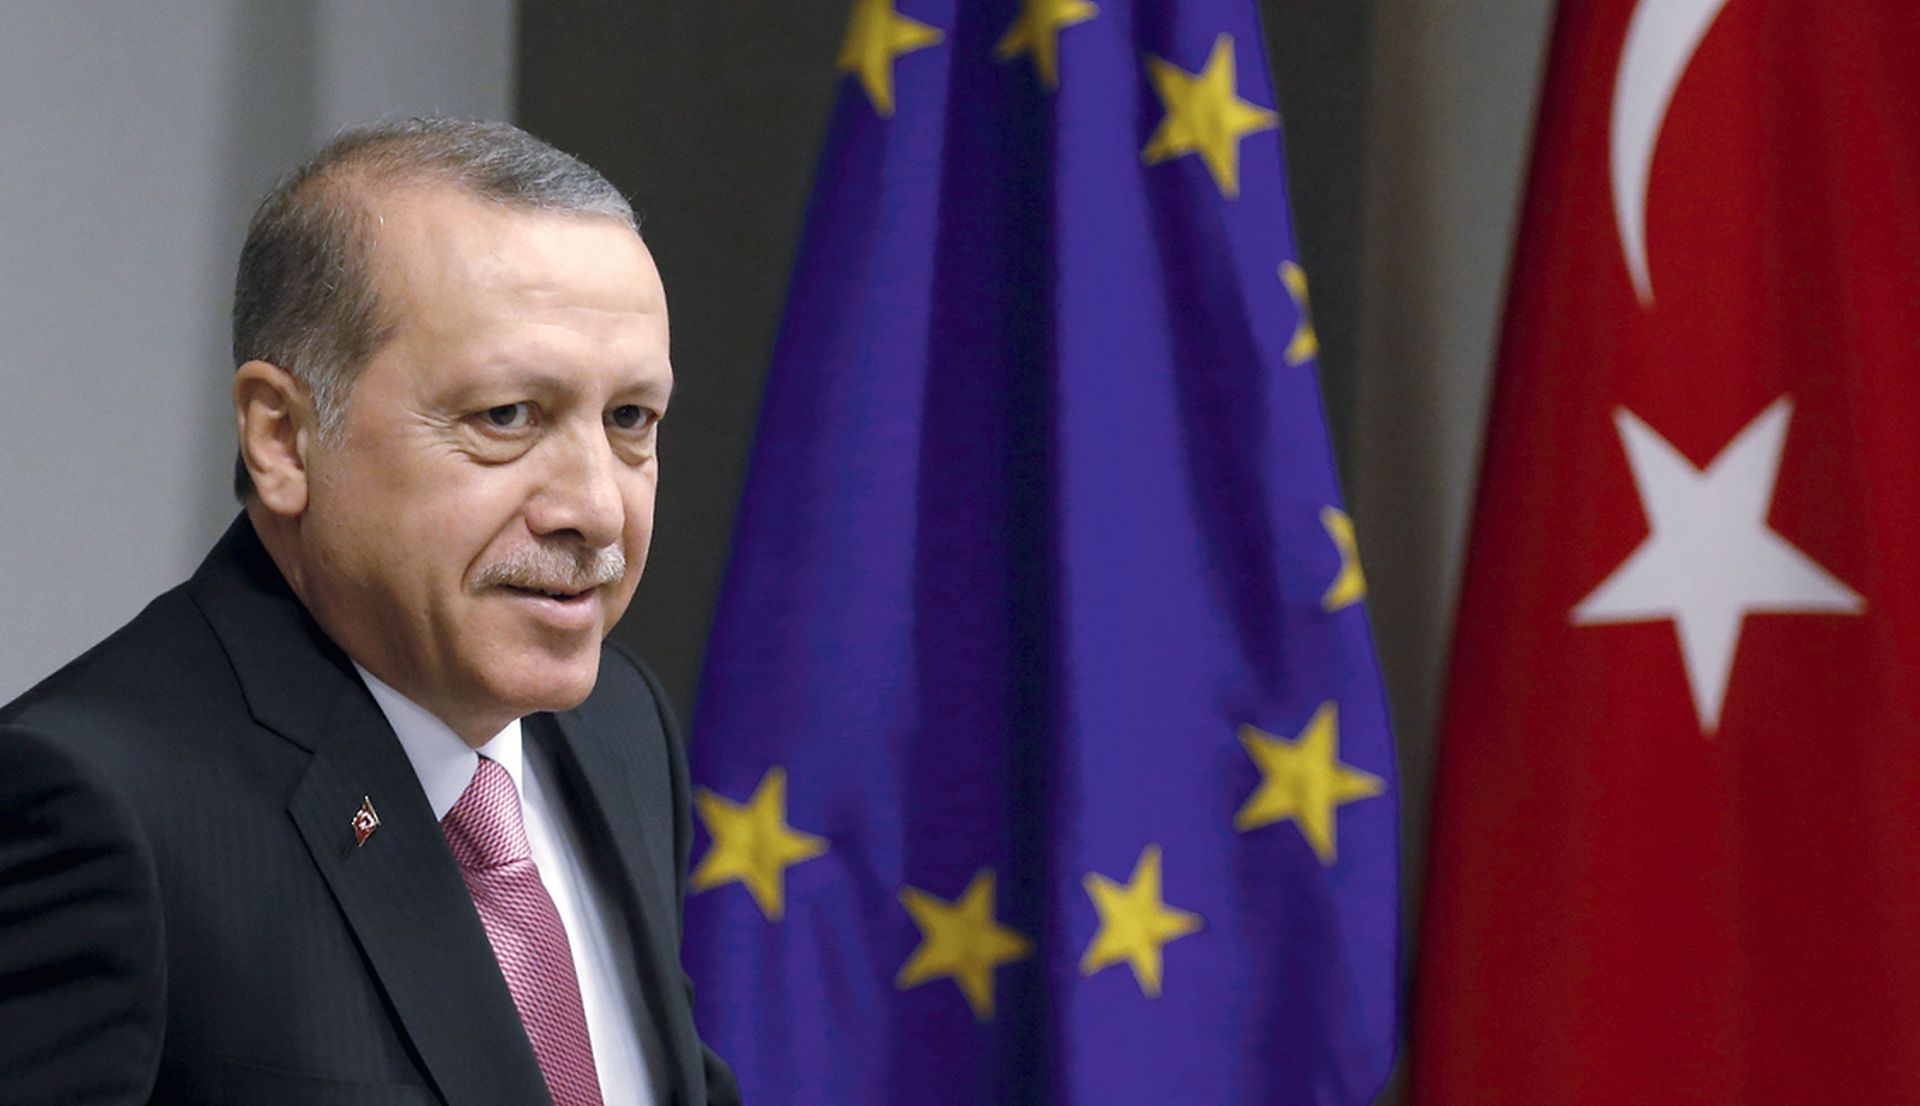 Erdoğanove manipulacije za prisvajanje europskih milijardi